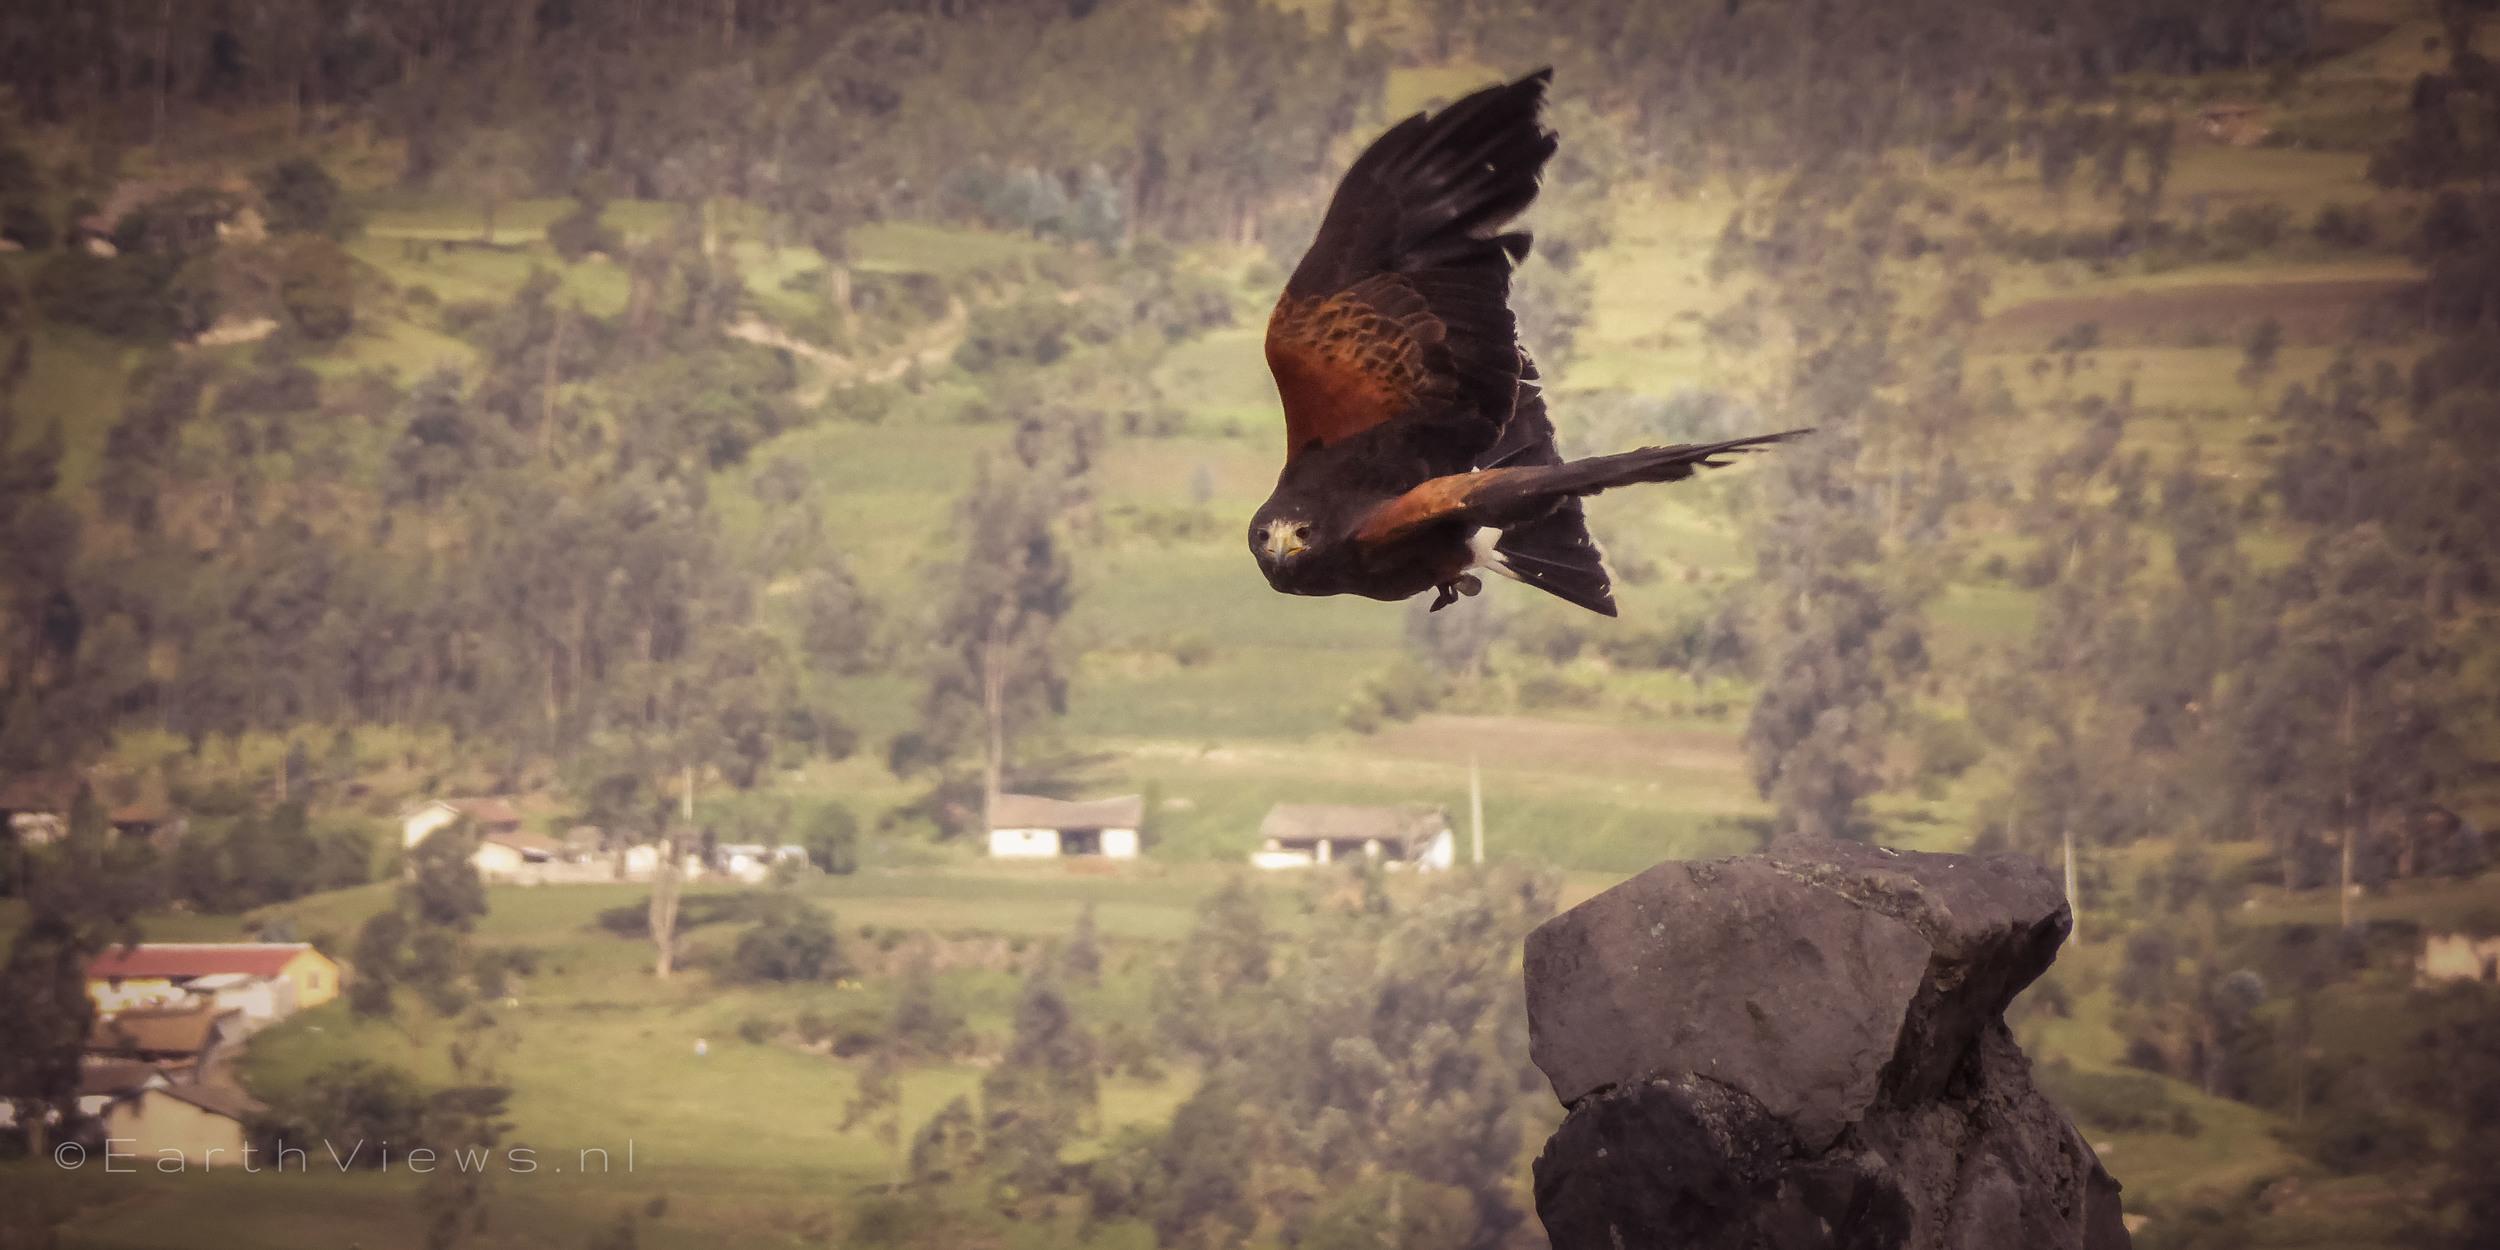 A Harris's hawk in flight at the Condor Park.